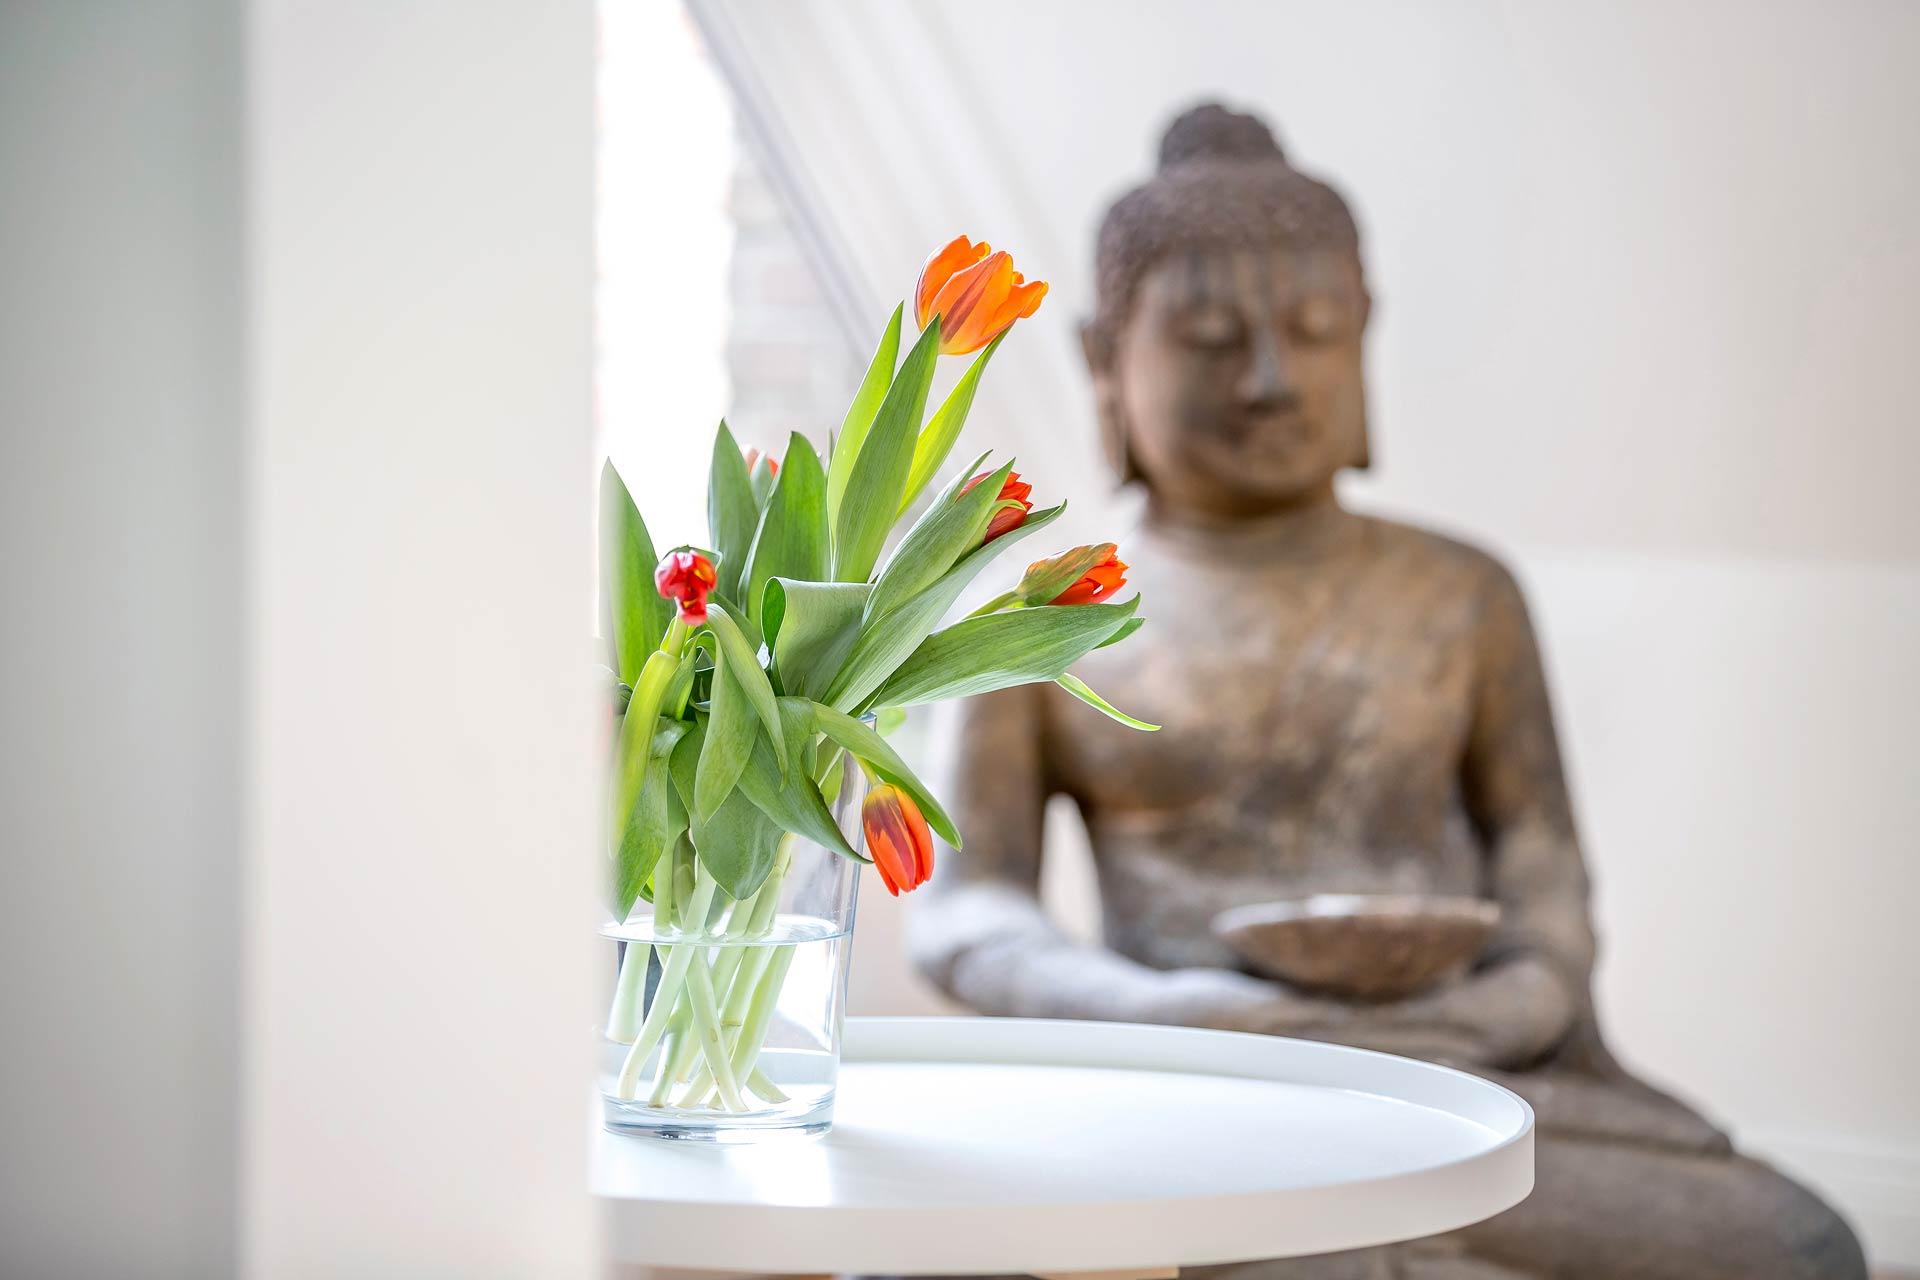 buddha-yogastudio-yogapraxis-eingang-tulpen